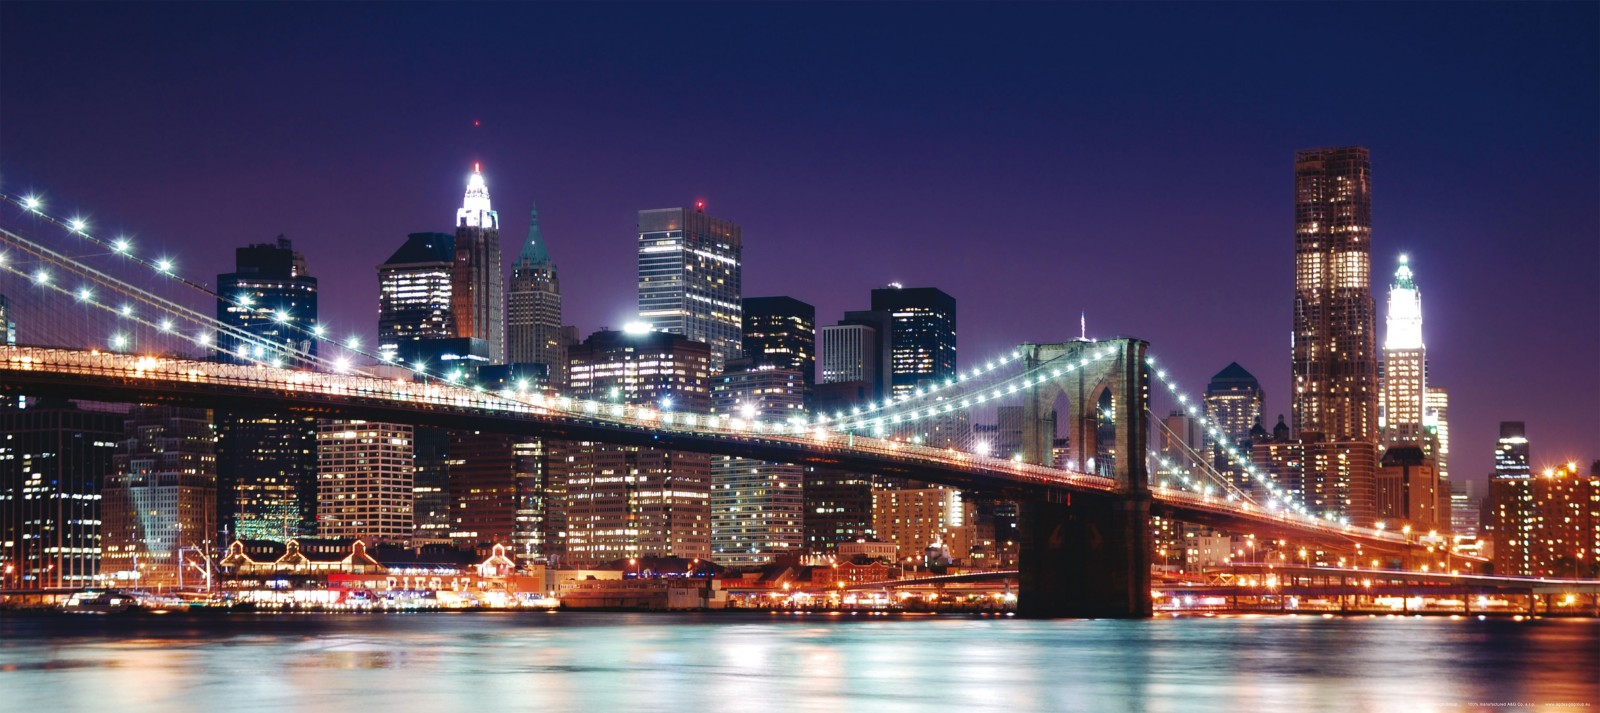 fototapete tapete brooklyn bridge nacht beleuchtet new. Black Bedroom Furniture Sets. Home Design Ideas